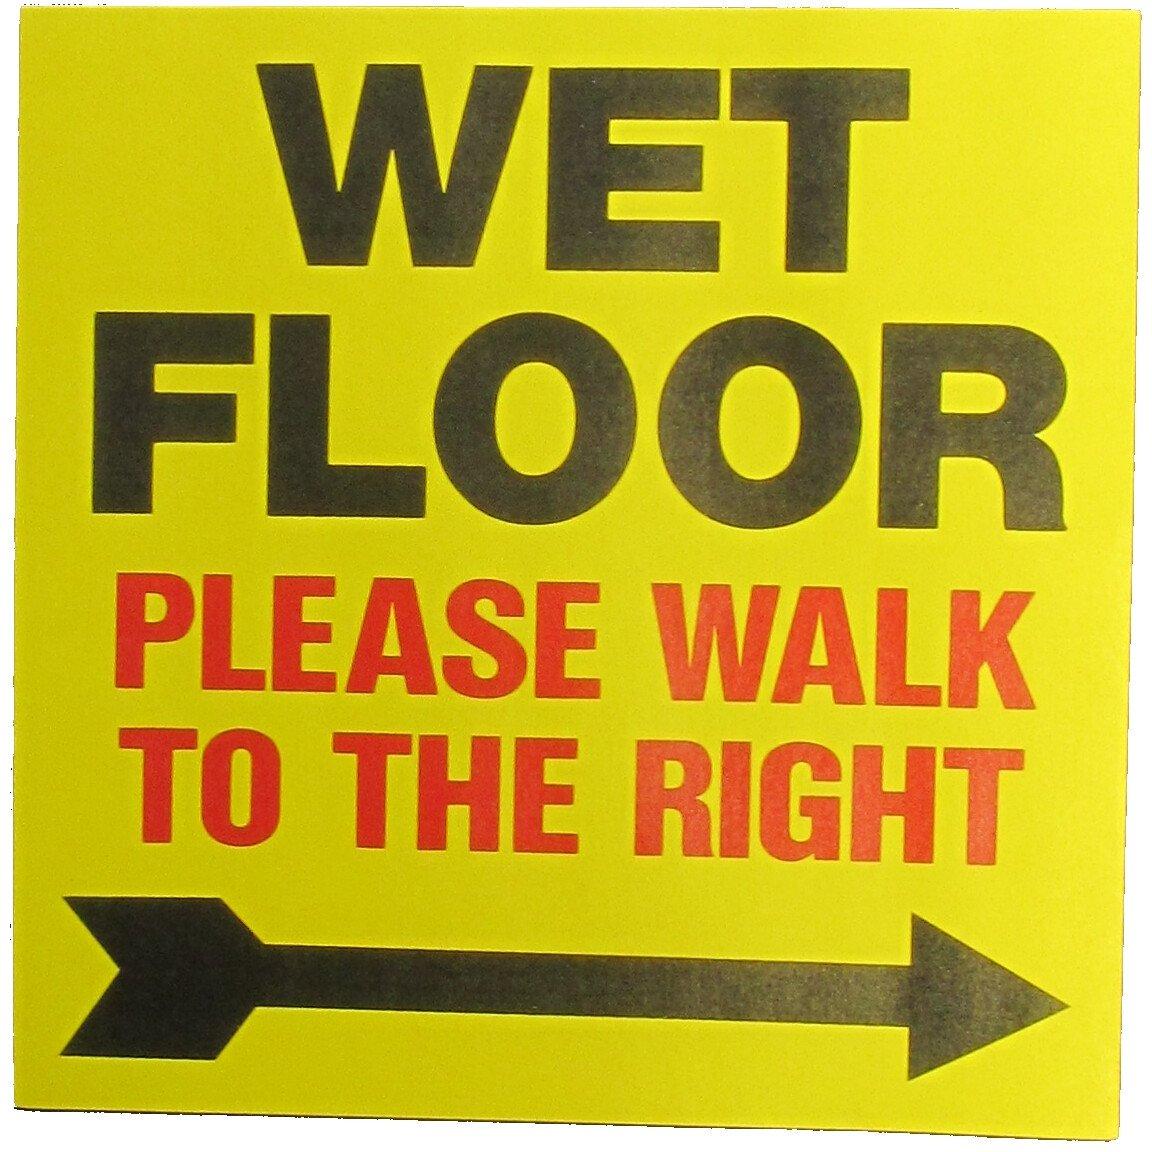 JSP Lamba CLJA042 'Wet Floor Right' Safety Message Label 21cm For Lock-In Sign Holder